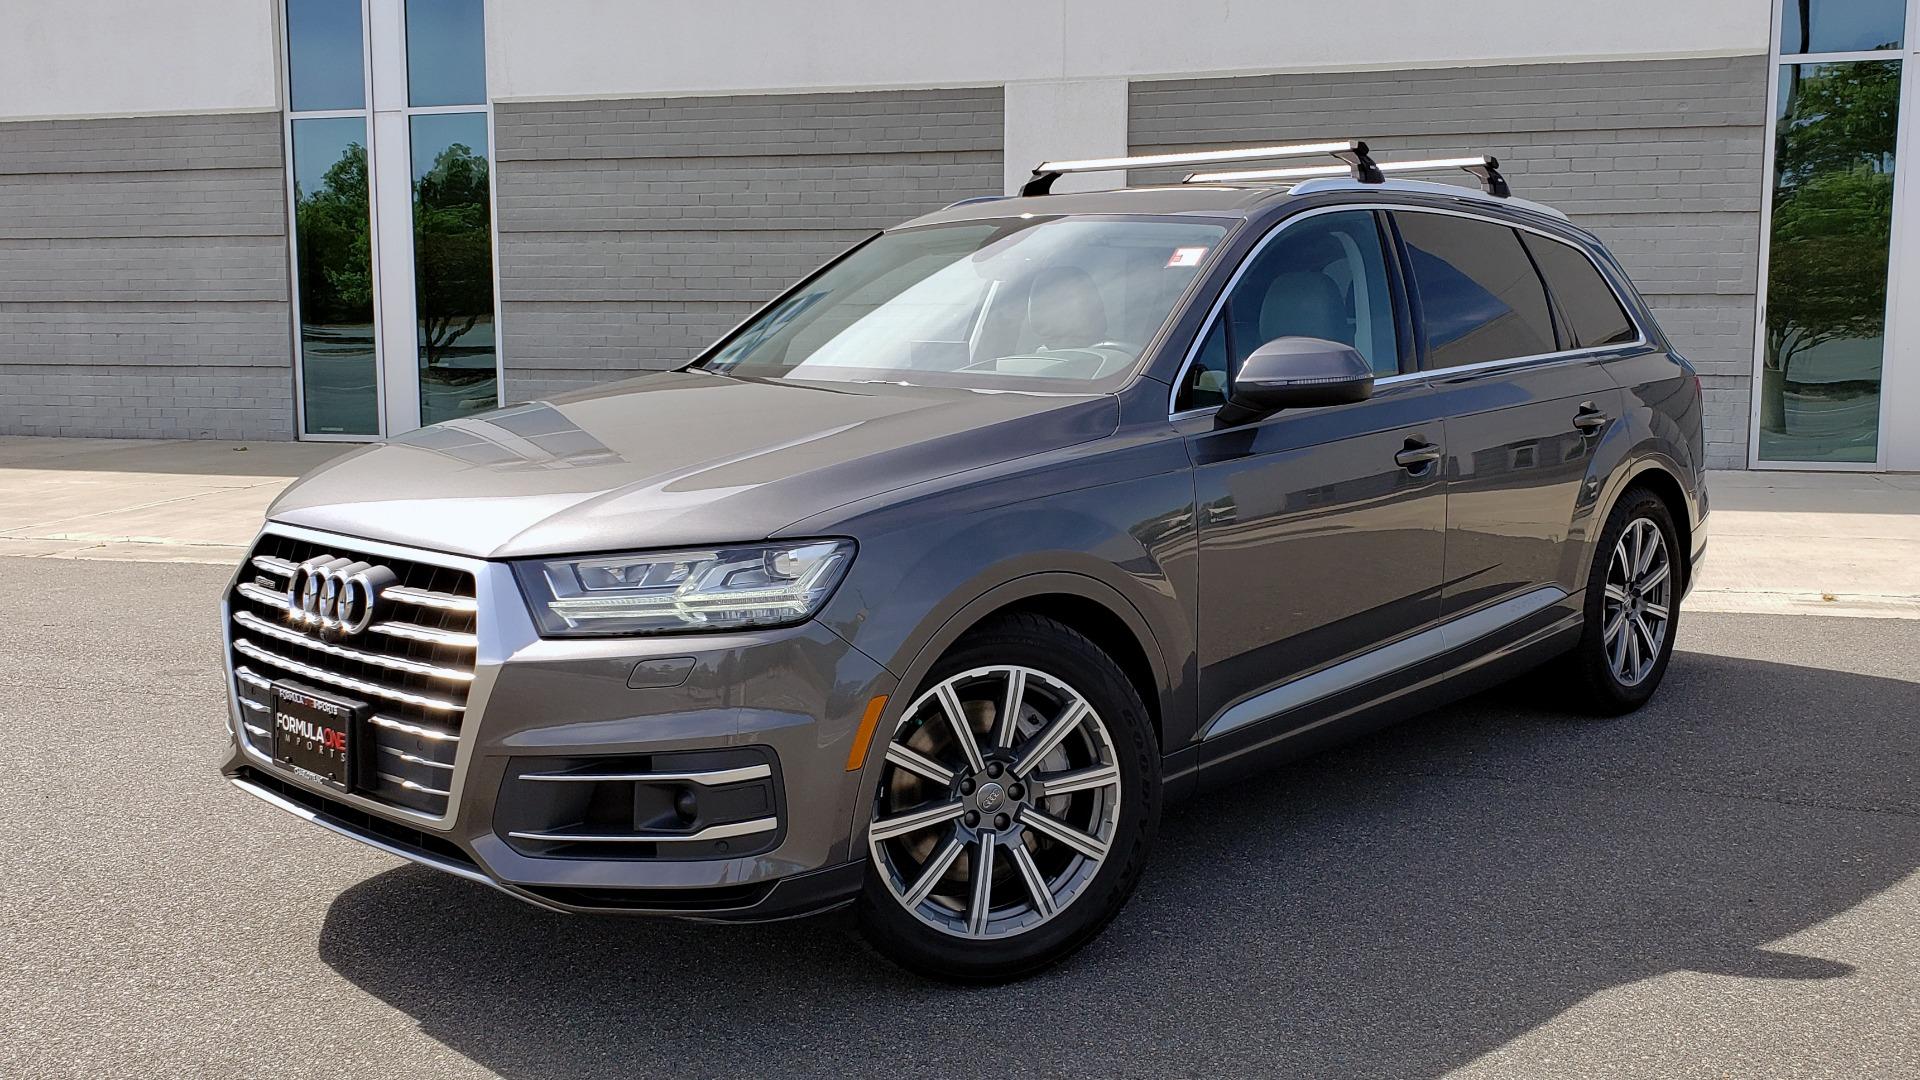 Used 2018 Audi Q7 PRESTIGE TIPTRONIC / NAV / SUNROOF / ADAPTIVE PKG / DRVR ASST / CLD WTHR /  for sale $49,995 at Formula Imports in Charlotte NC 28227 1